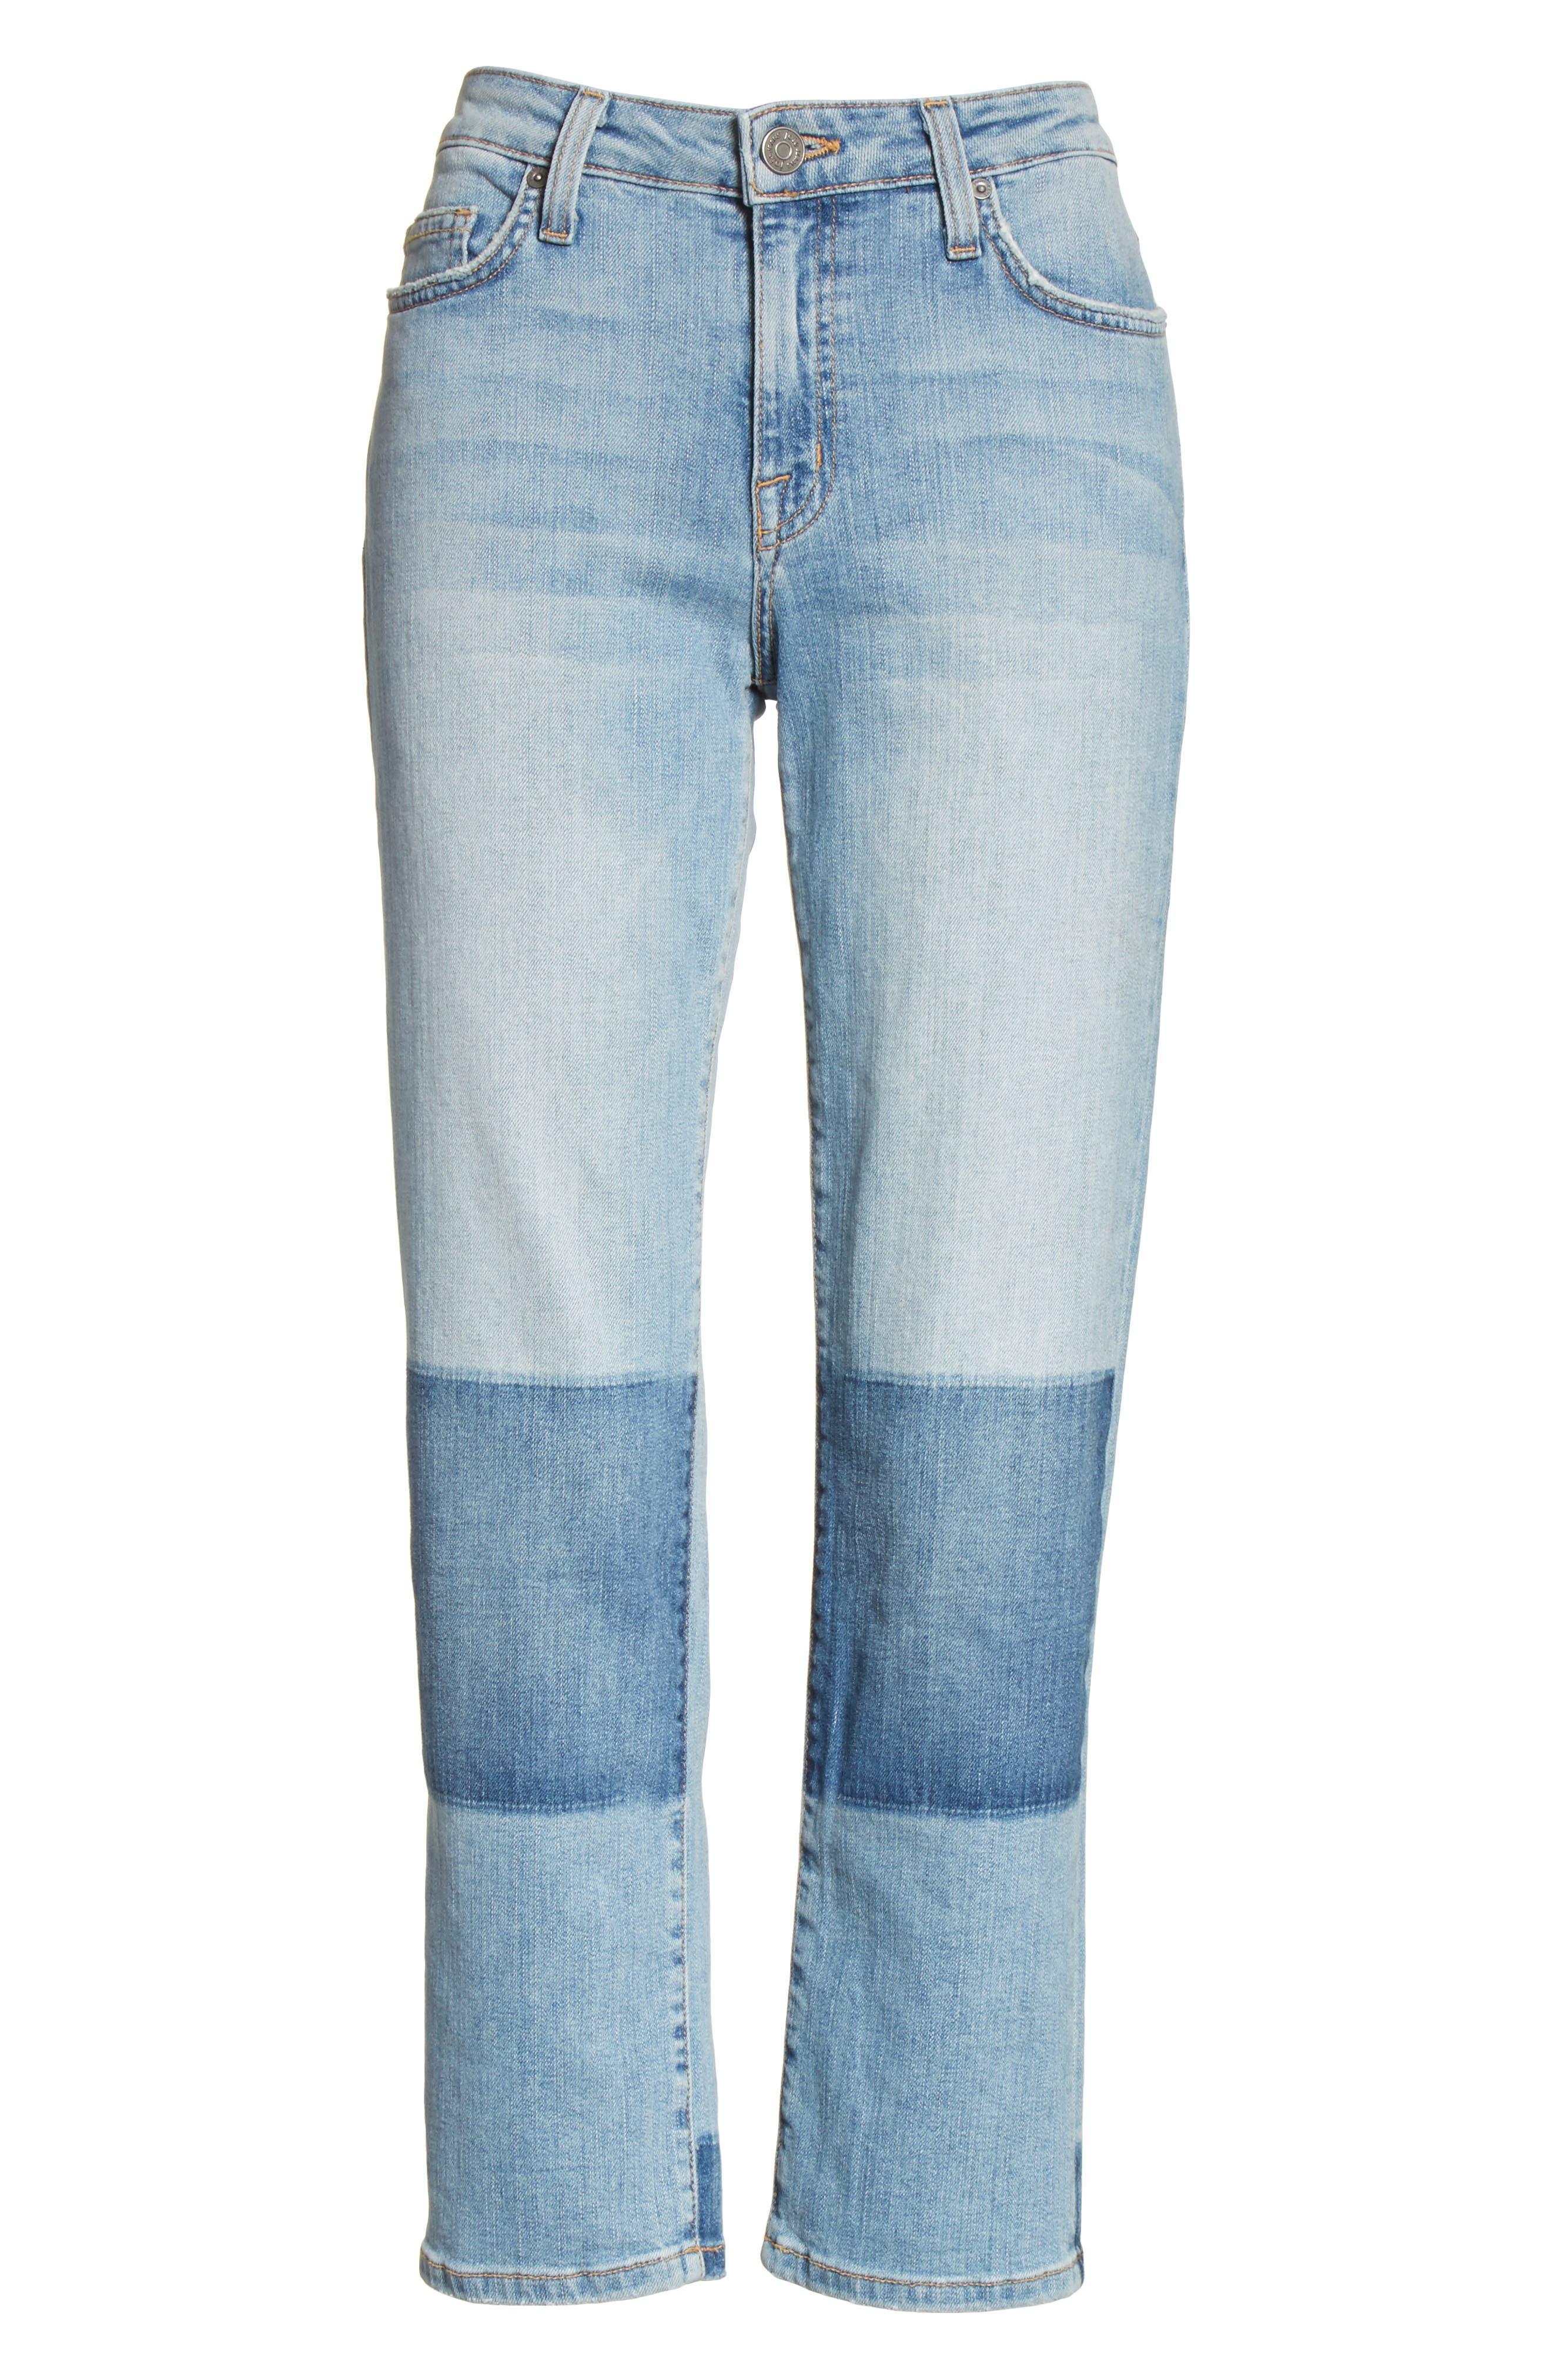 Josalind Straight Leg Crop Jeans,                             Alternate thumbnail 6, color,                             479